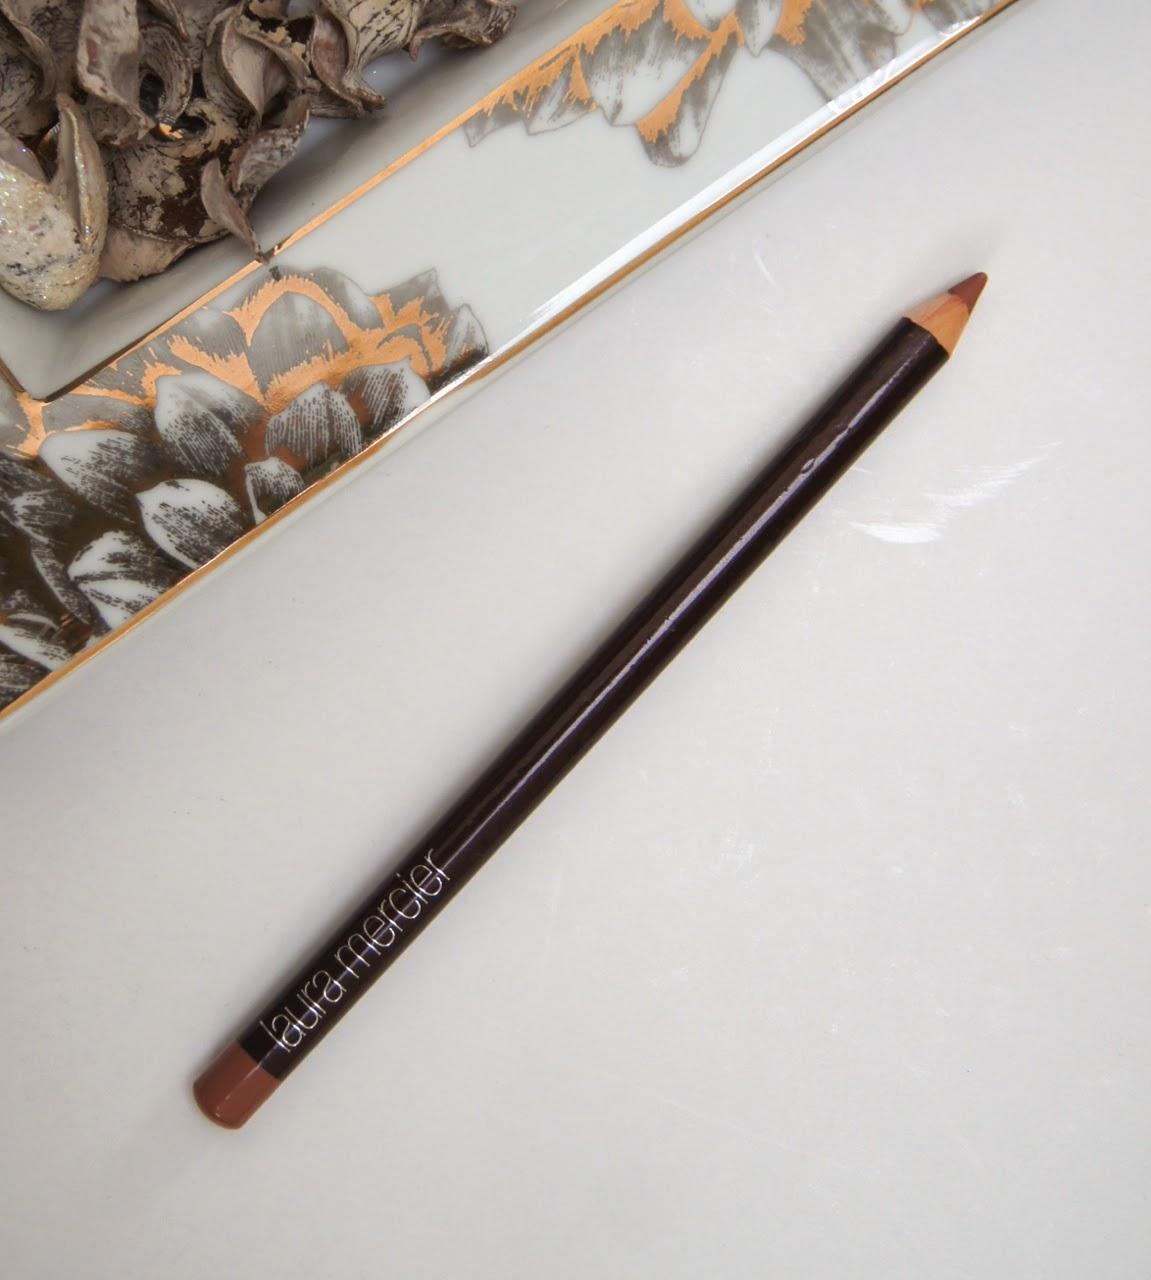 laura mercier natural lips lip pencil review swatch top 5 best nude lipliners